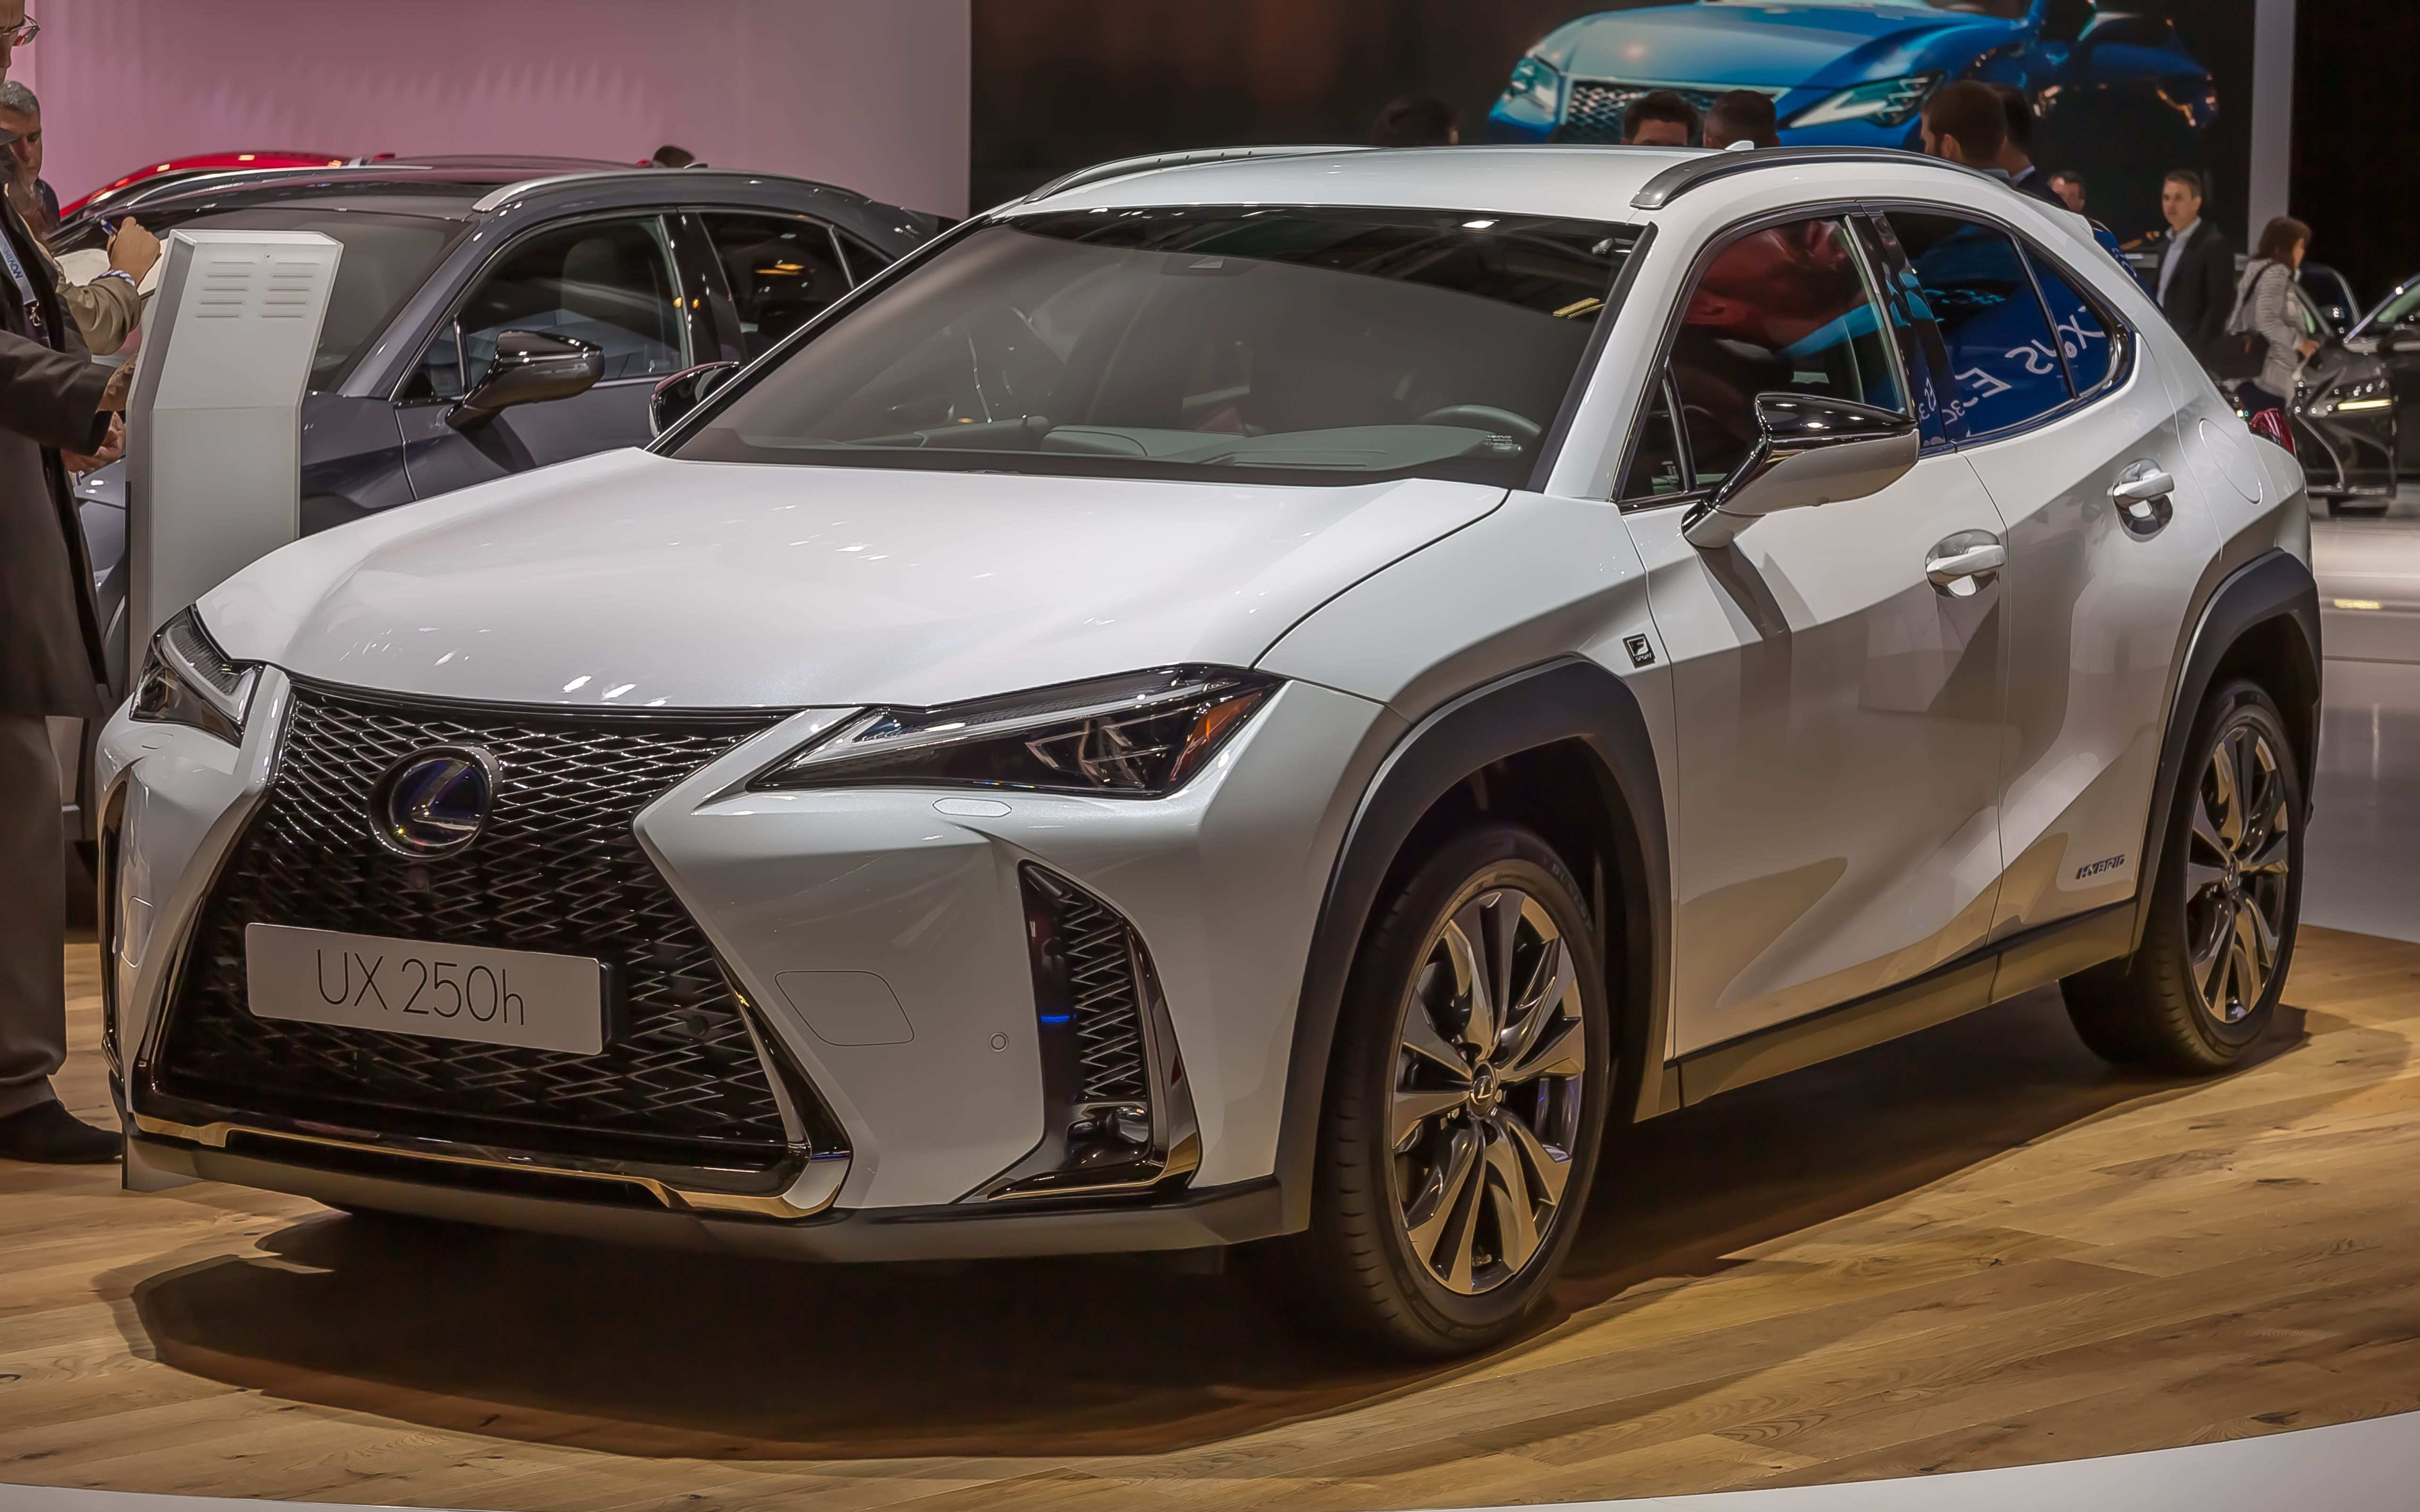 52 Gallery of Lexus 2019 Ux Release Date Rumors for Lexus 2019 Ux Release Date